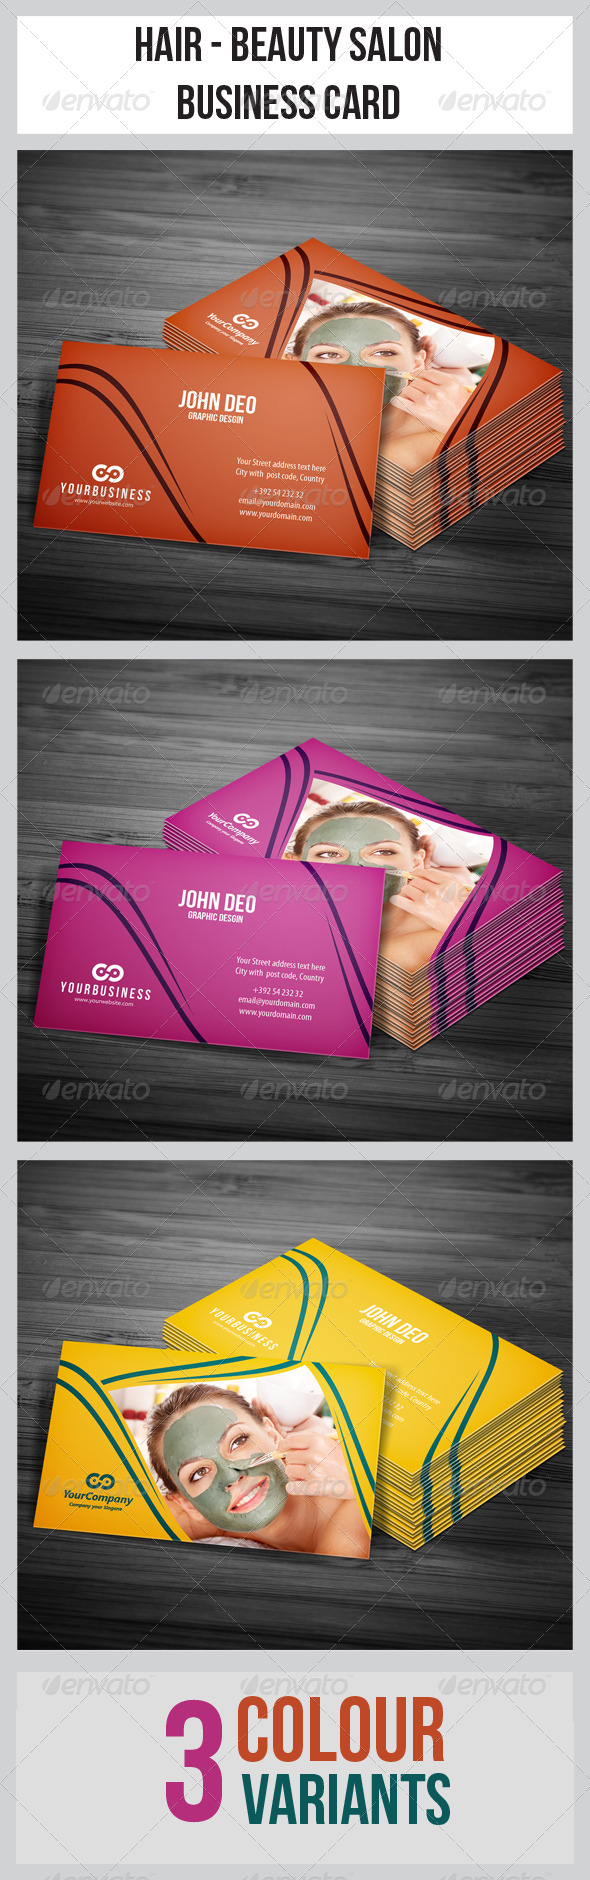 Graphicriver hair beauty salon business card 4756432